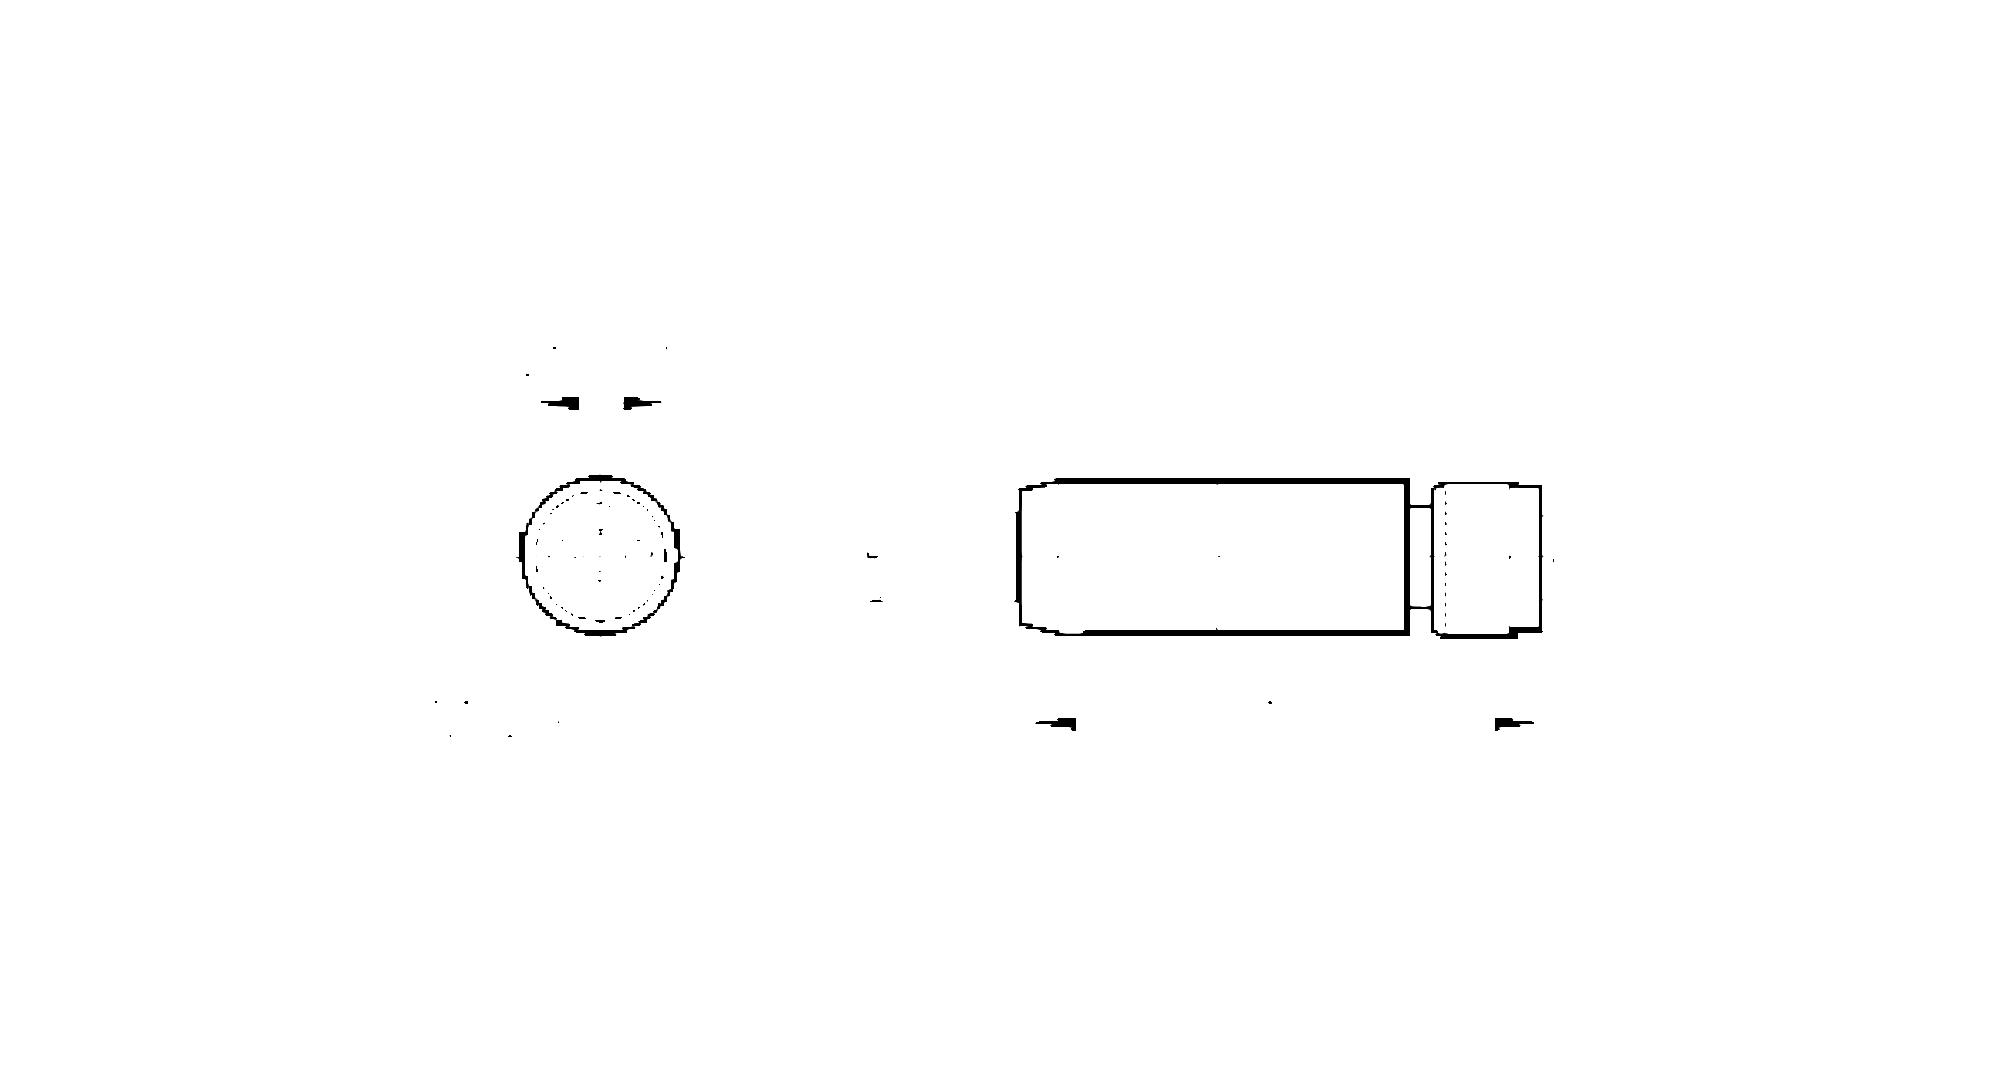 e18519 - female cordset